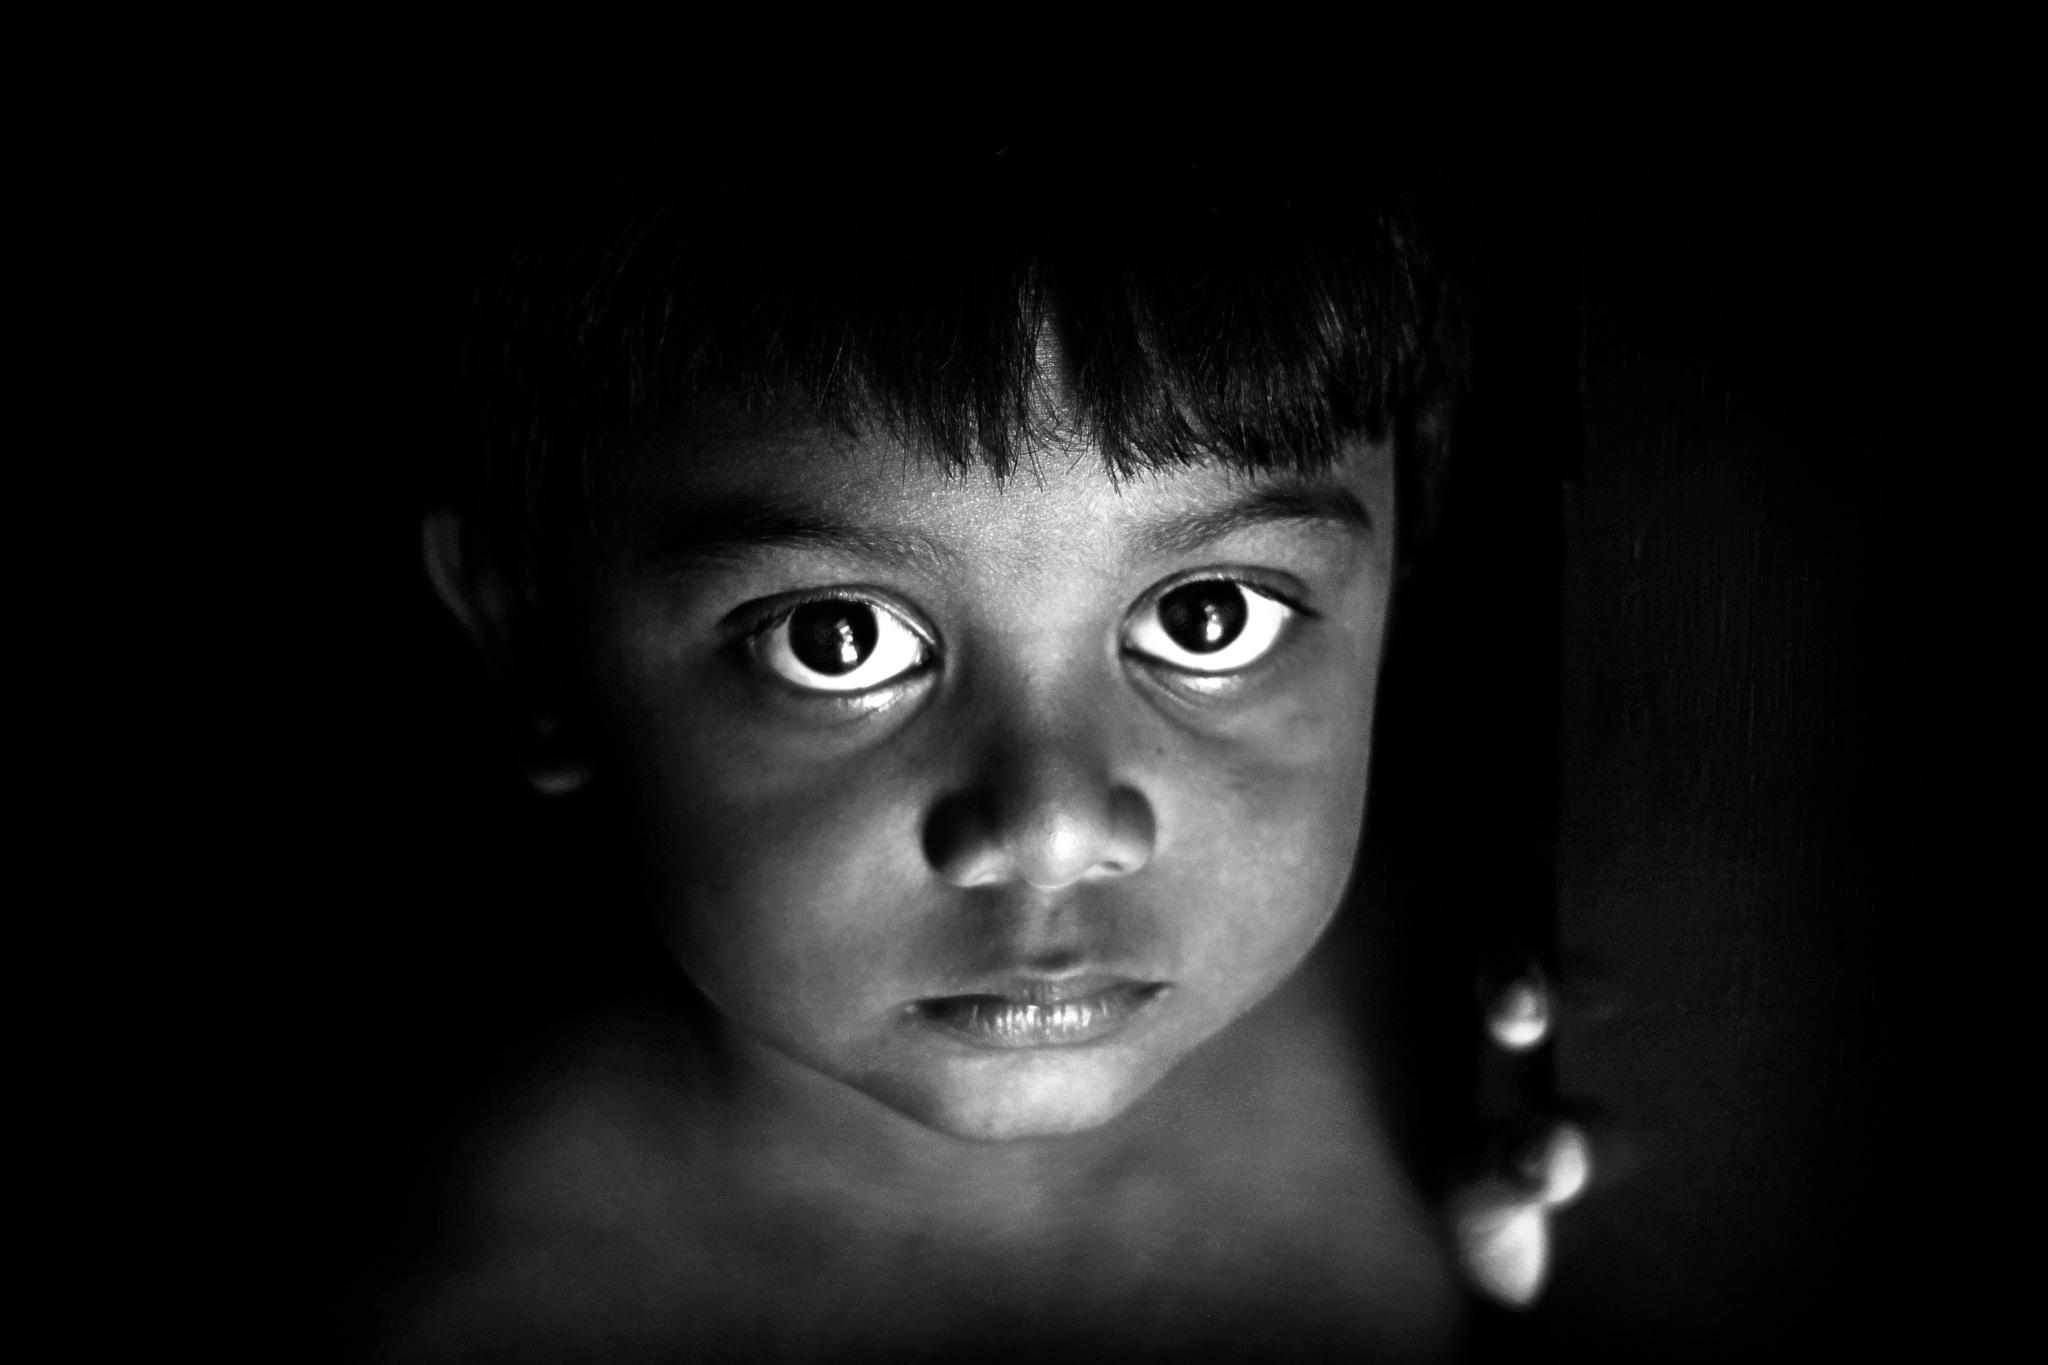 Innocence by Radhakrishna Rao